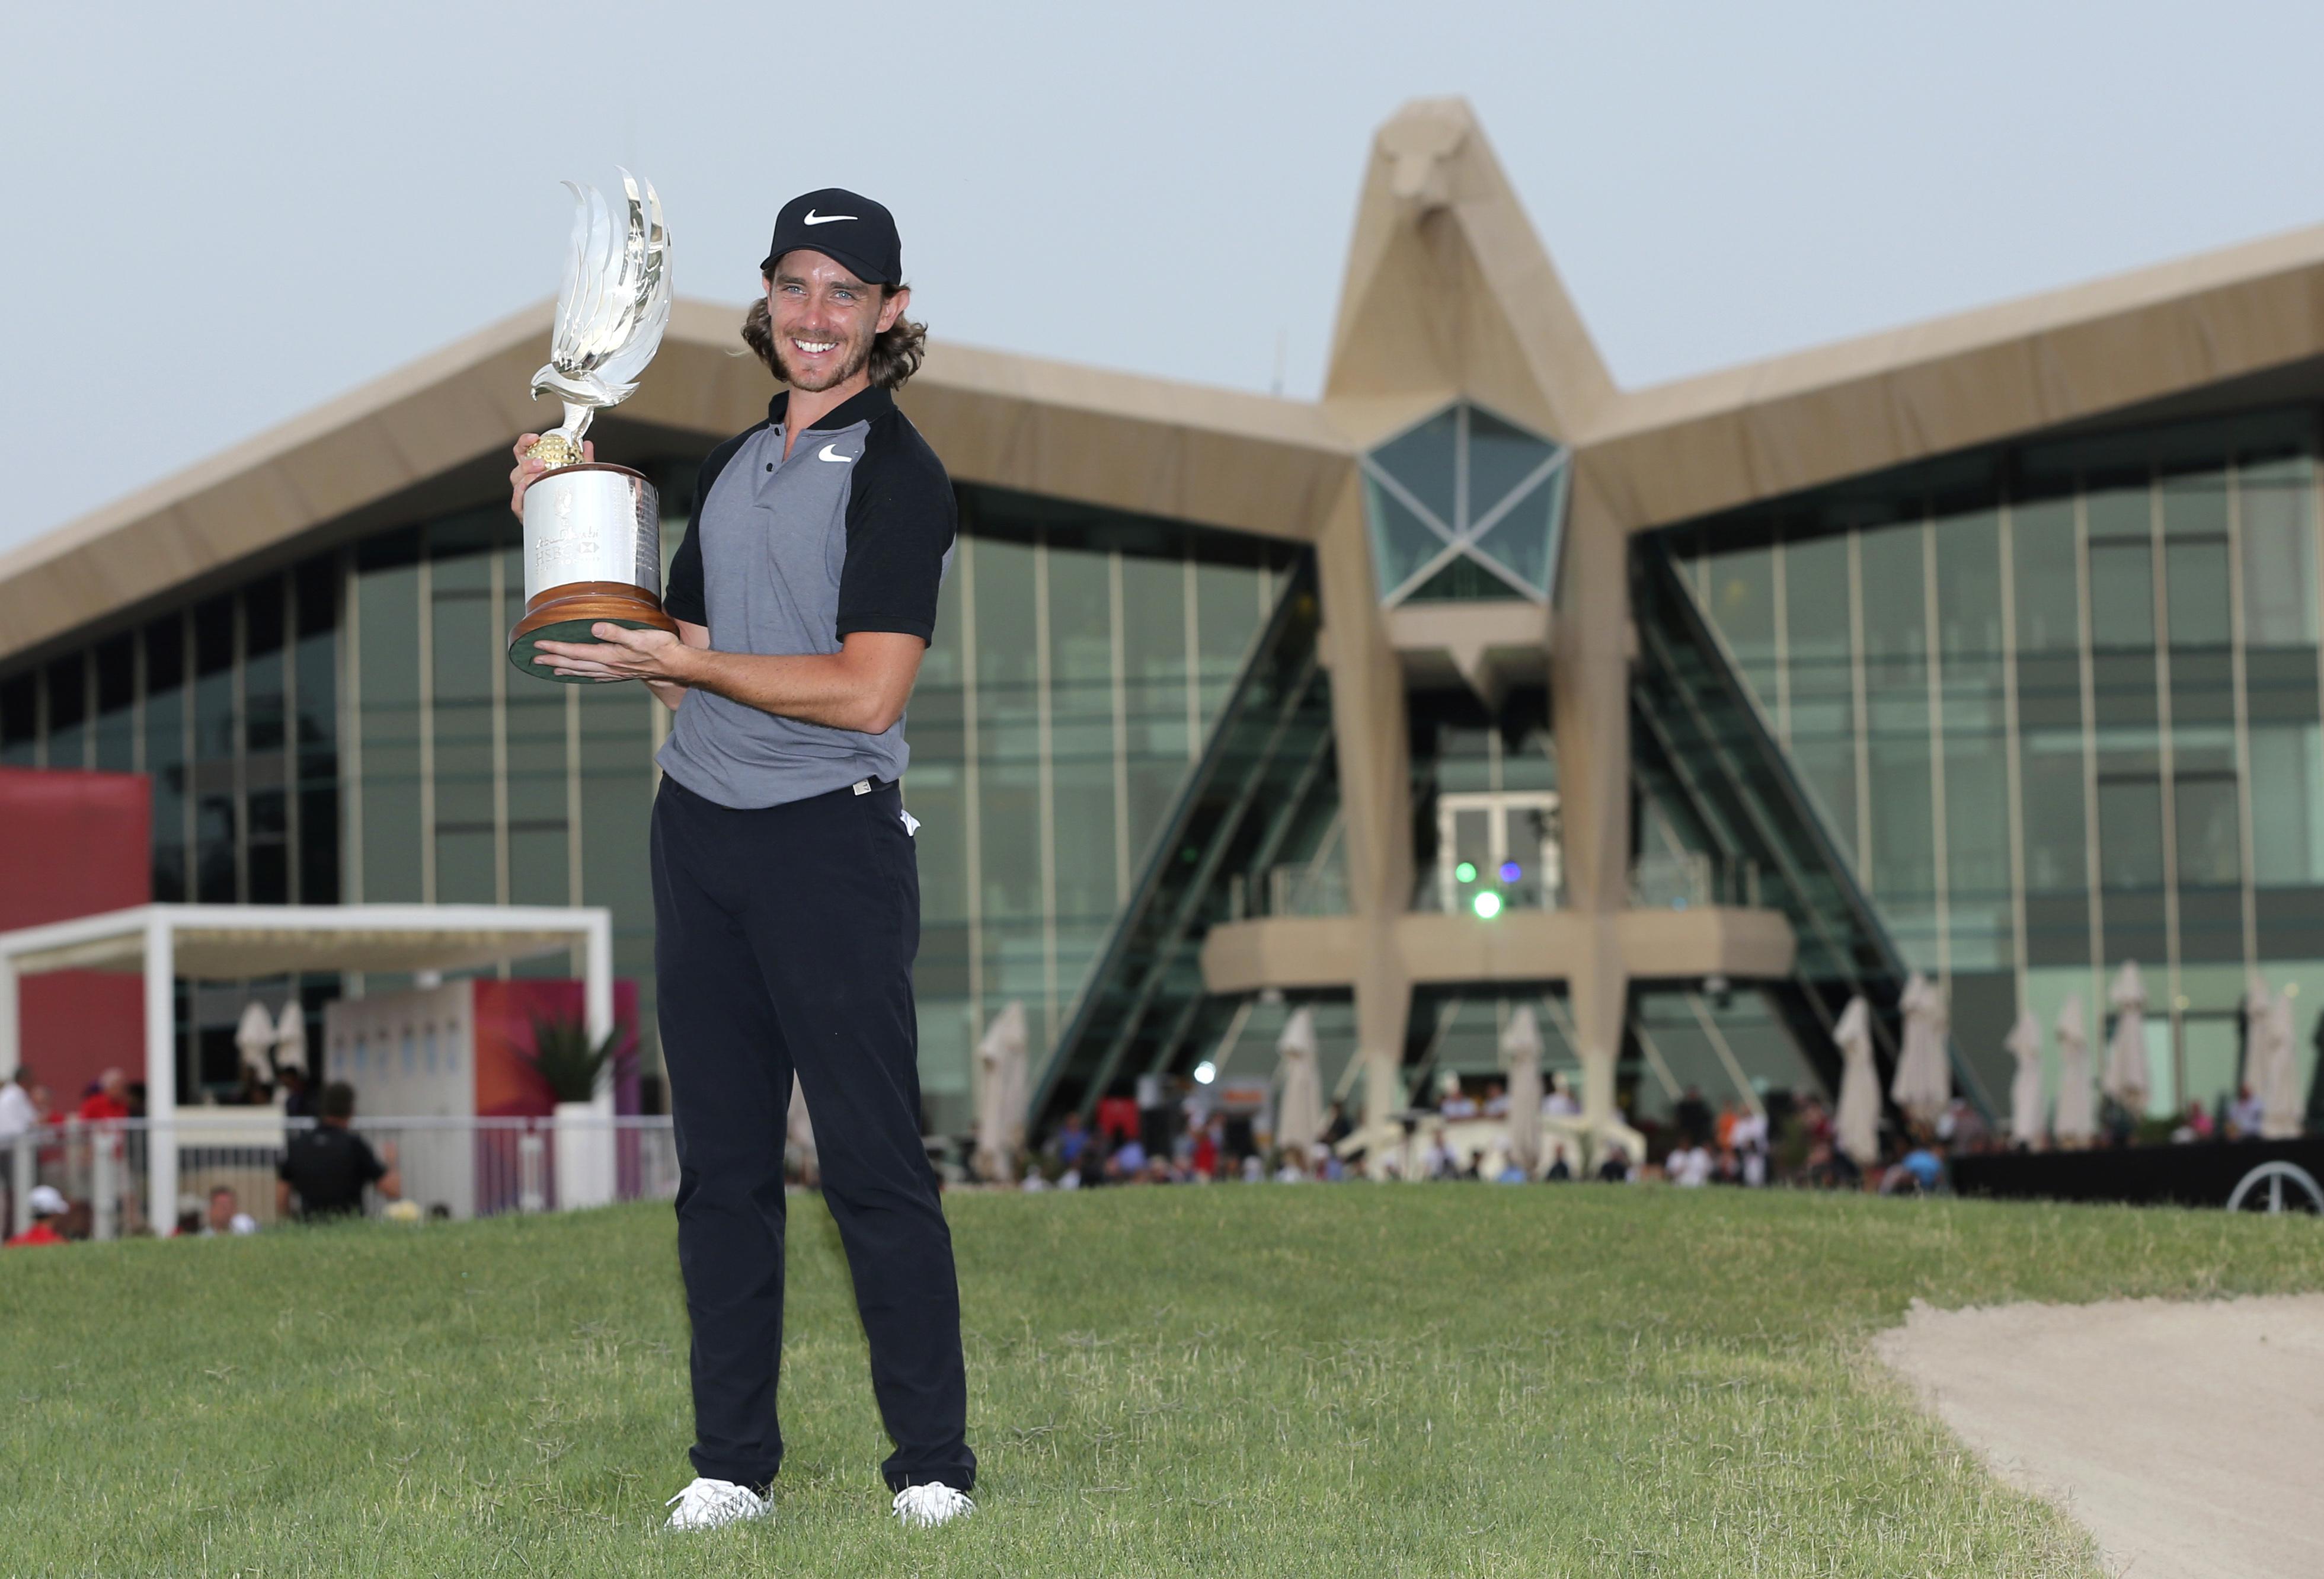 Tommy Fleetwood of England holds the trophy after he won the Abu Dhabi Golf Championship, in Abu Dhabi, United Arab Emirates, Sunday, Jan. 22, 2017. (AP Photo/Kamran Jebreili)